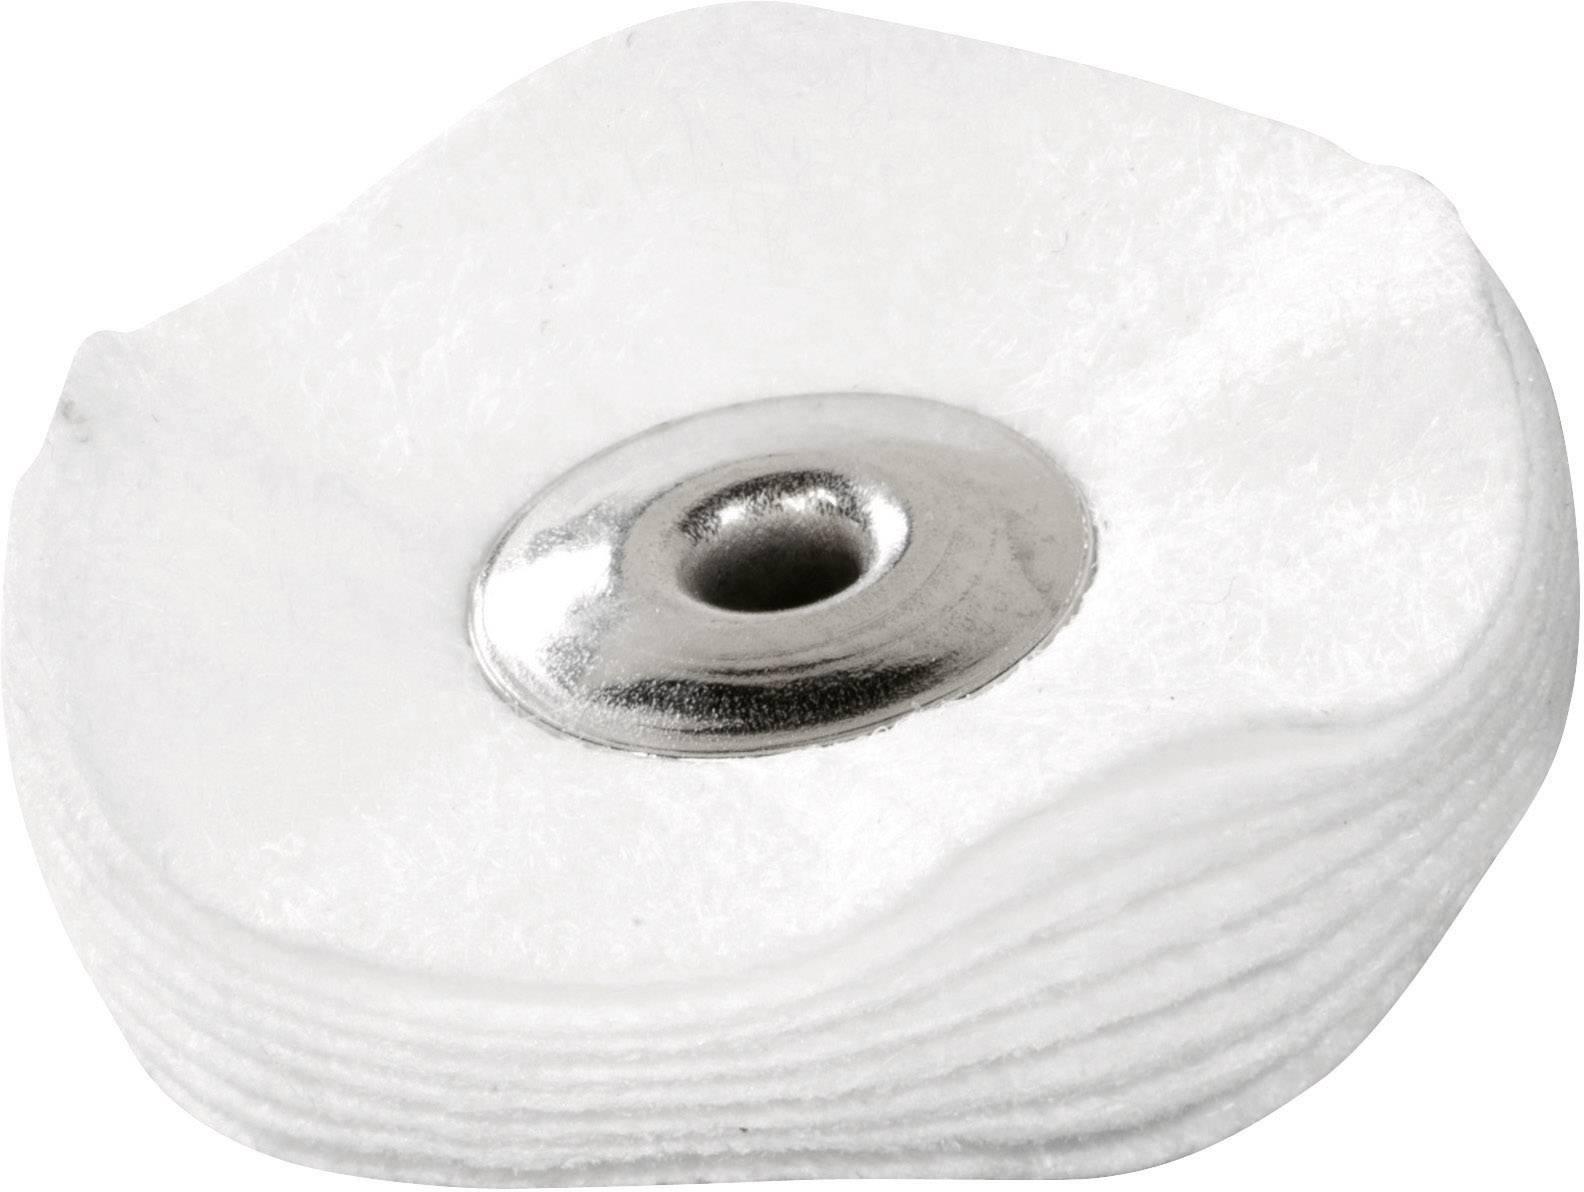 Textilný leštiaci kotúč Ø 25 mm SpeedClick Dremel 423 Dremel 2615S423JA 1 ks